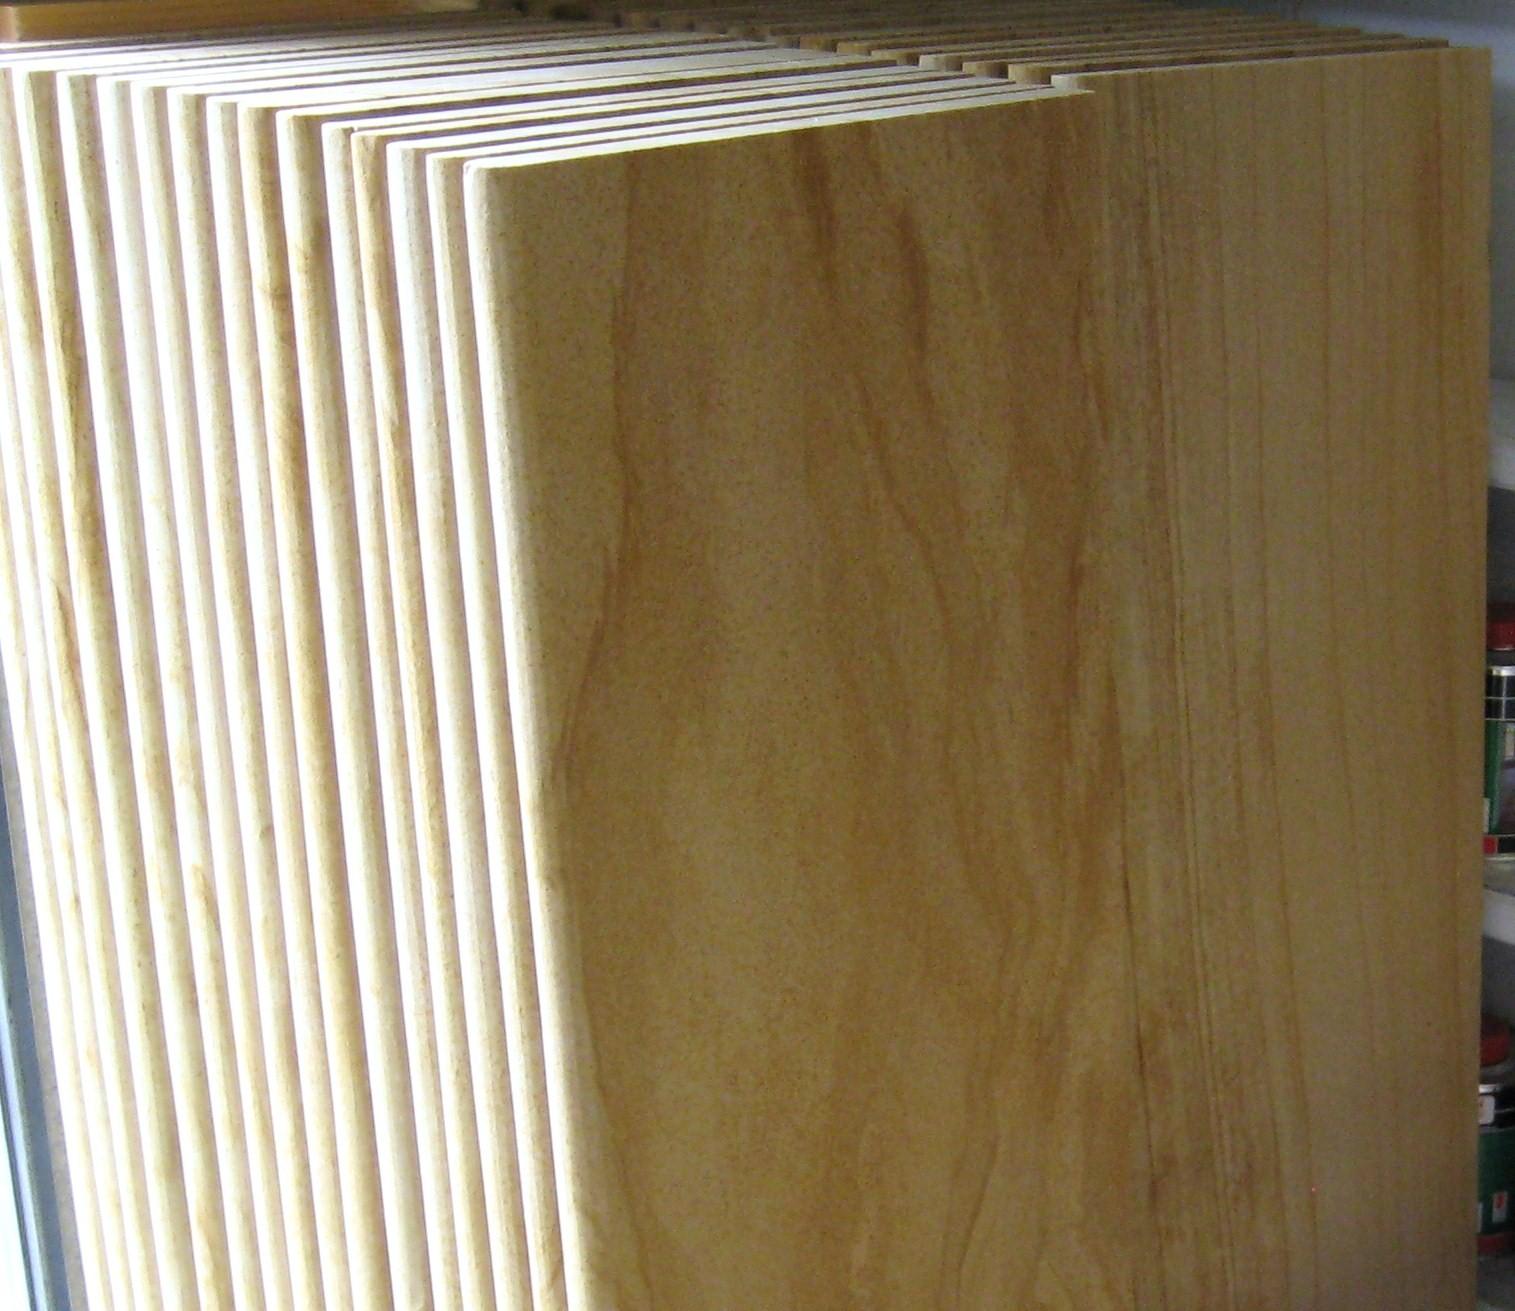 9. Woodgrain sandstone